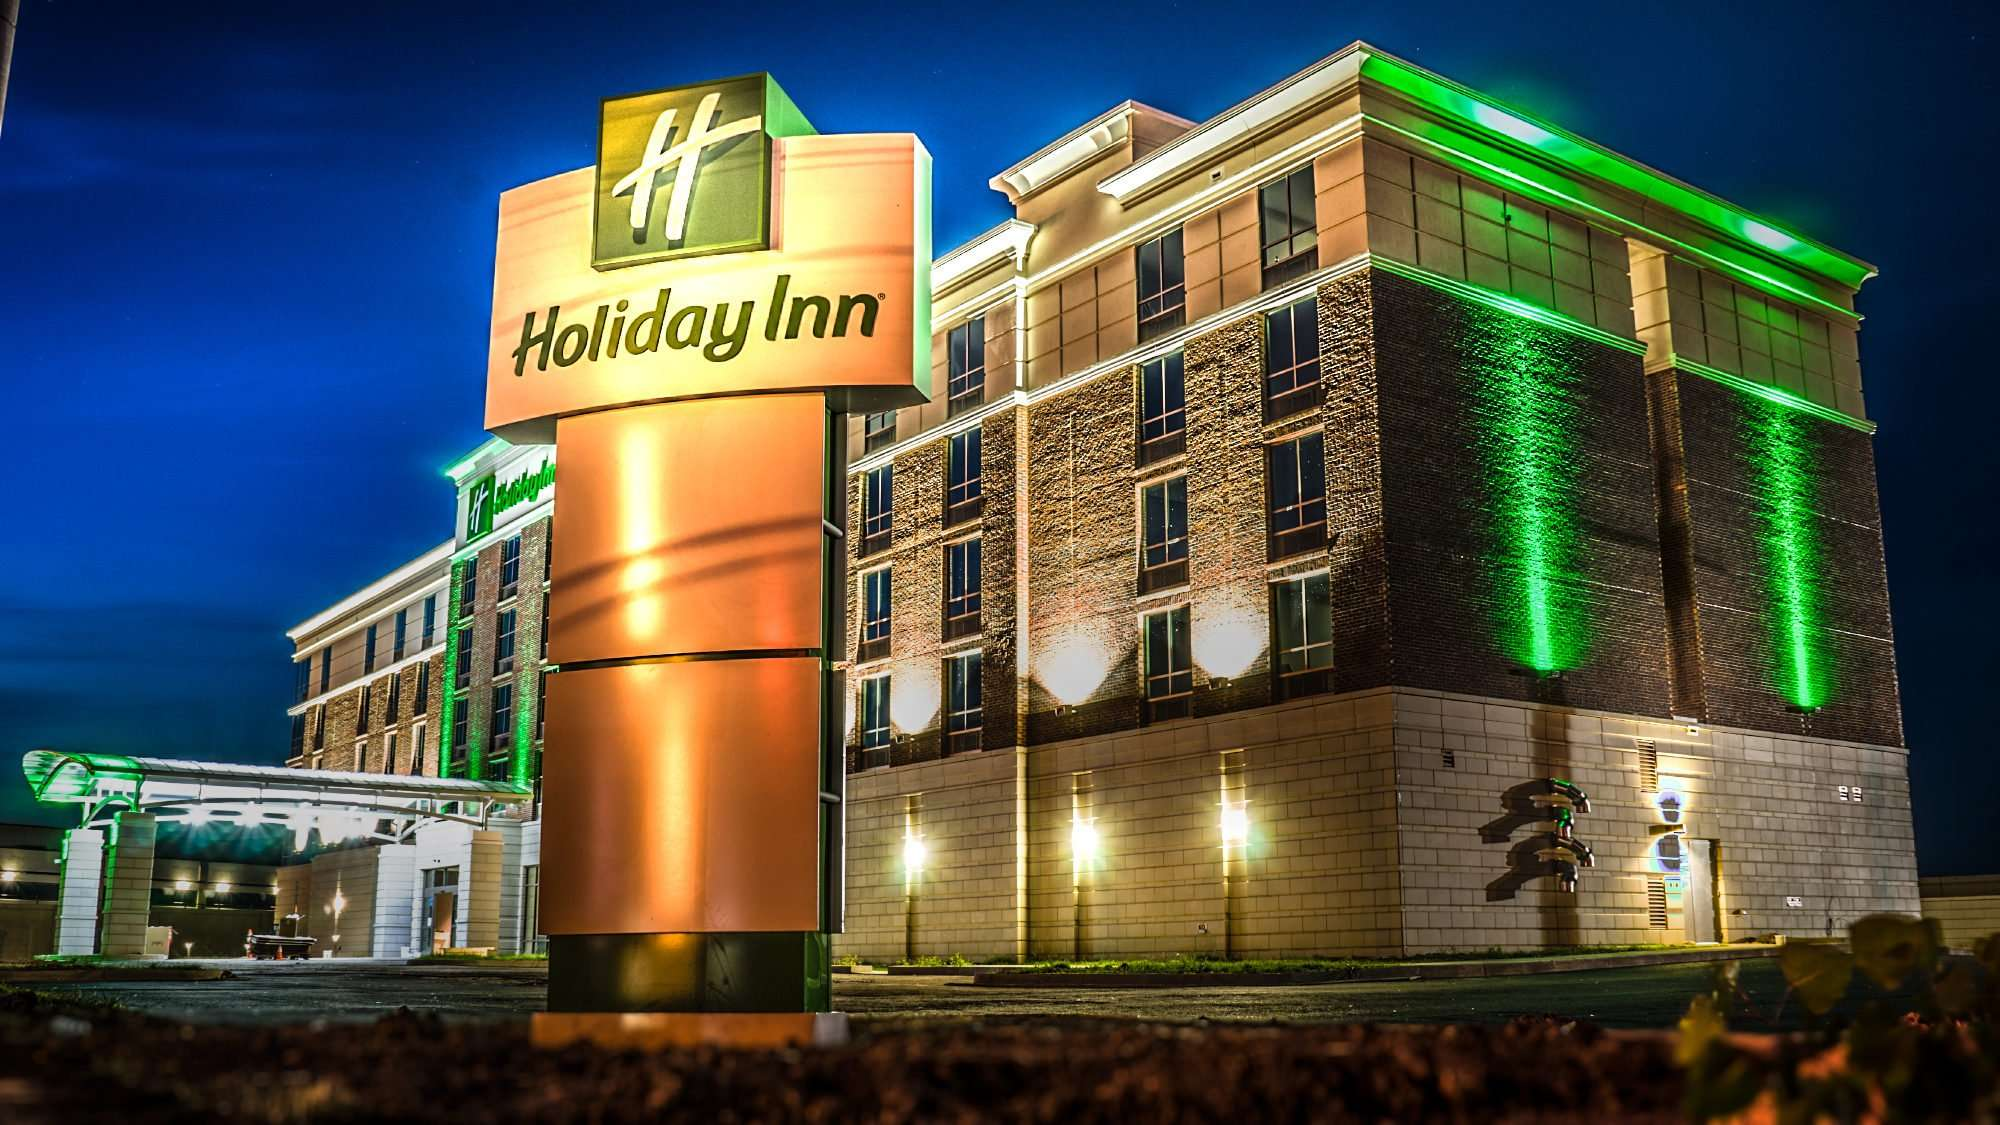 June 2, 2017 - Holiday Inn under construction, downtown, Paducah, KY/photonews247.com